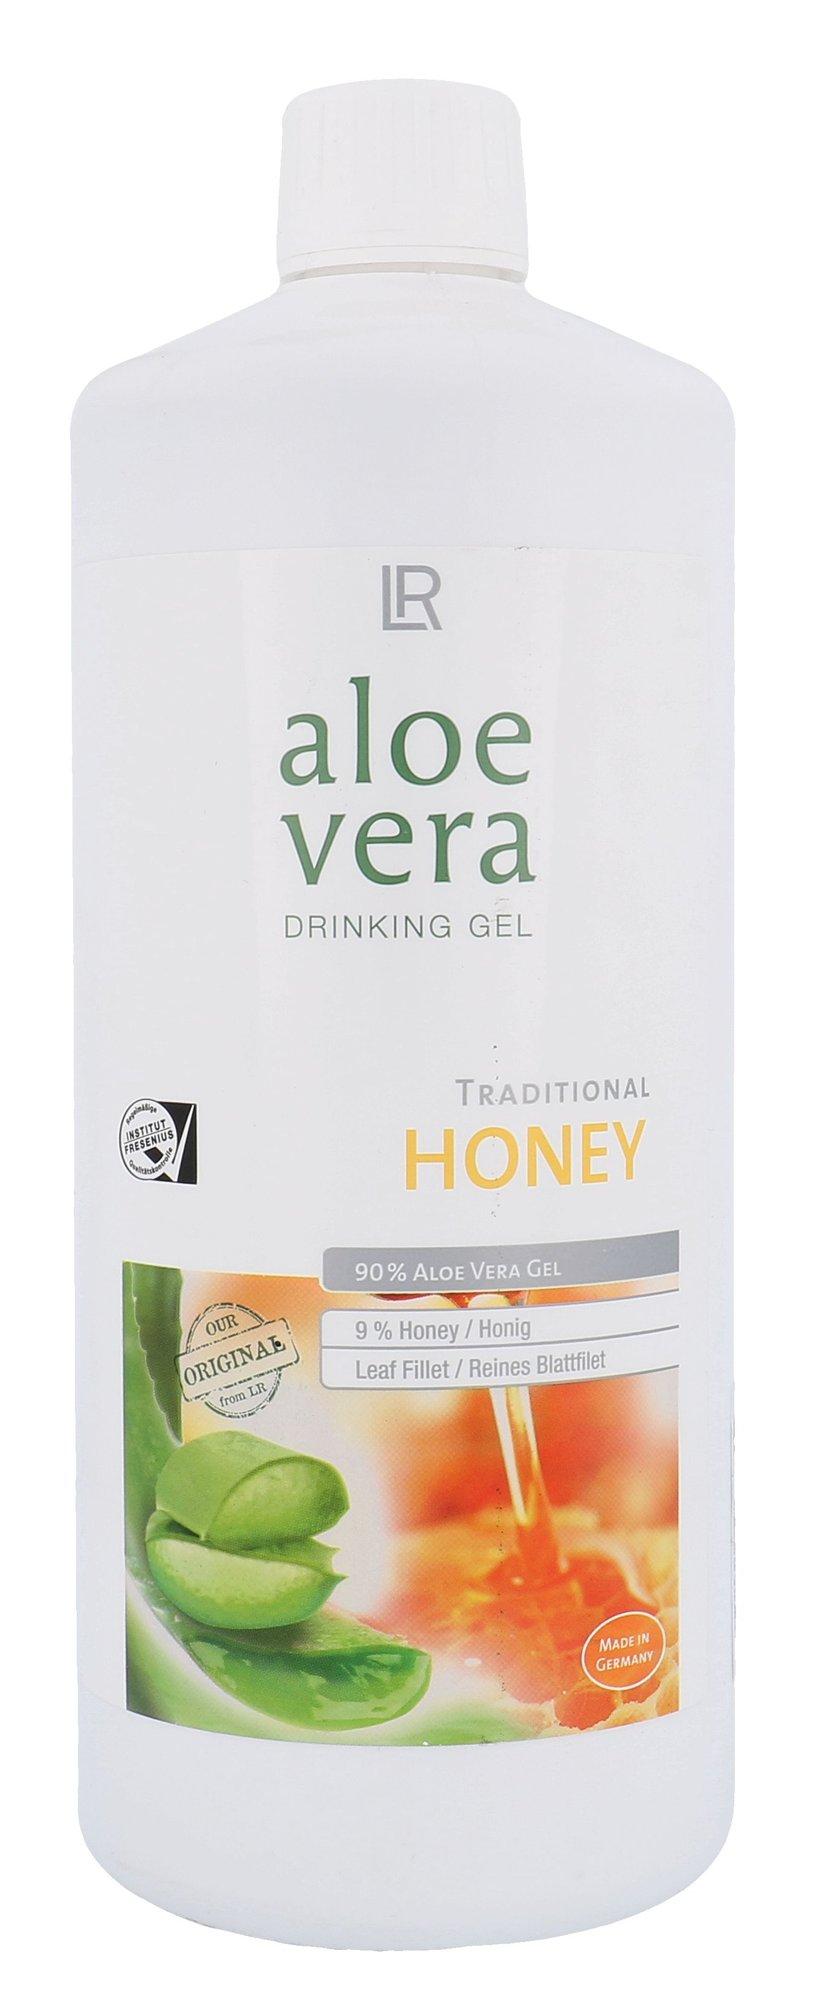 LR Aloe Vera Cosmetic 1000ml  Drinking Gel Honey